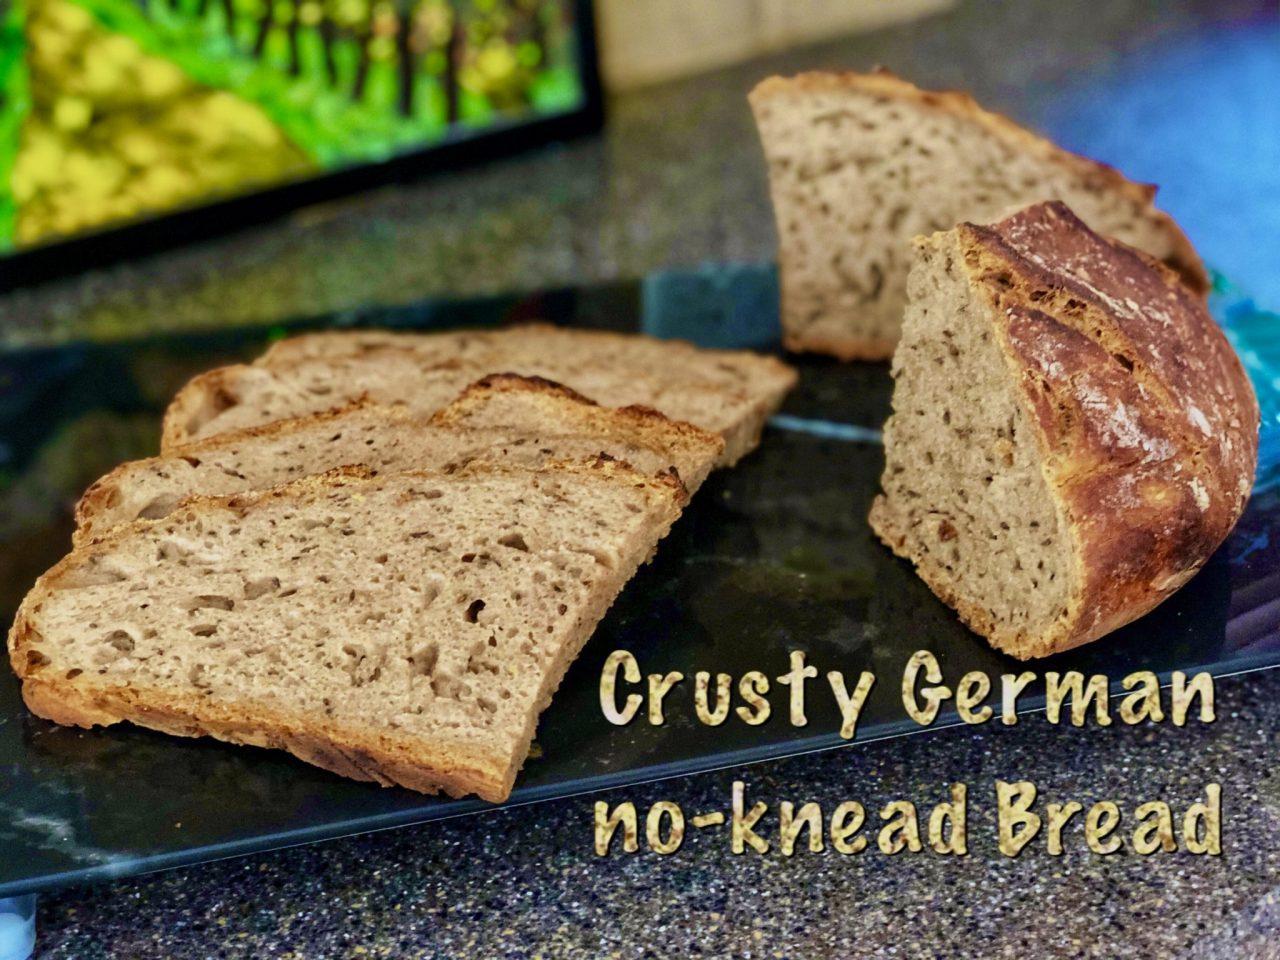 Bake German bread, Crusty farmers bread. Bauernbrot